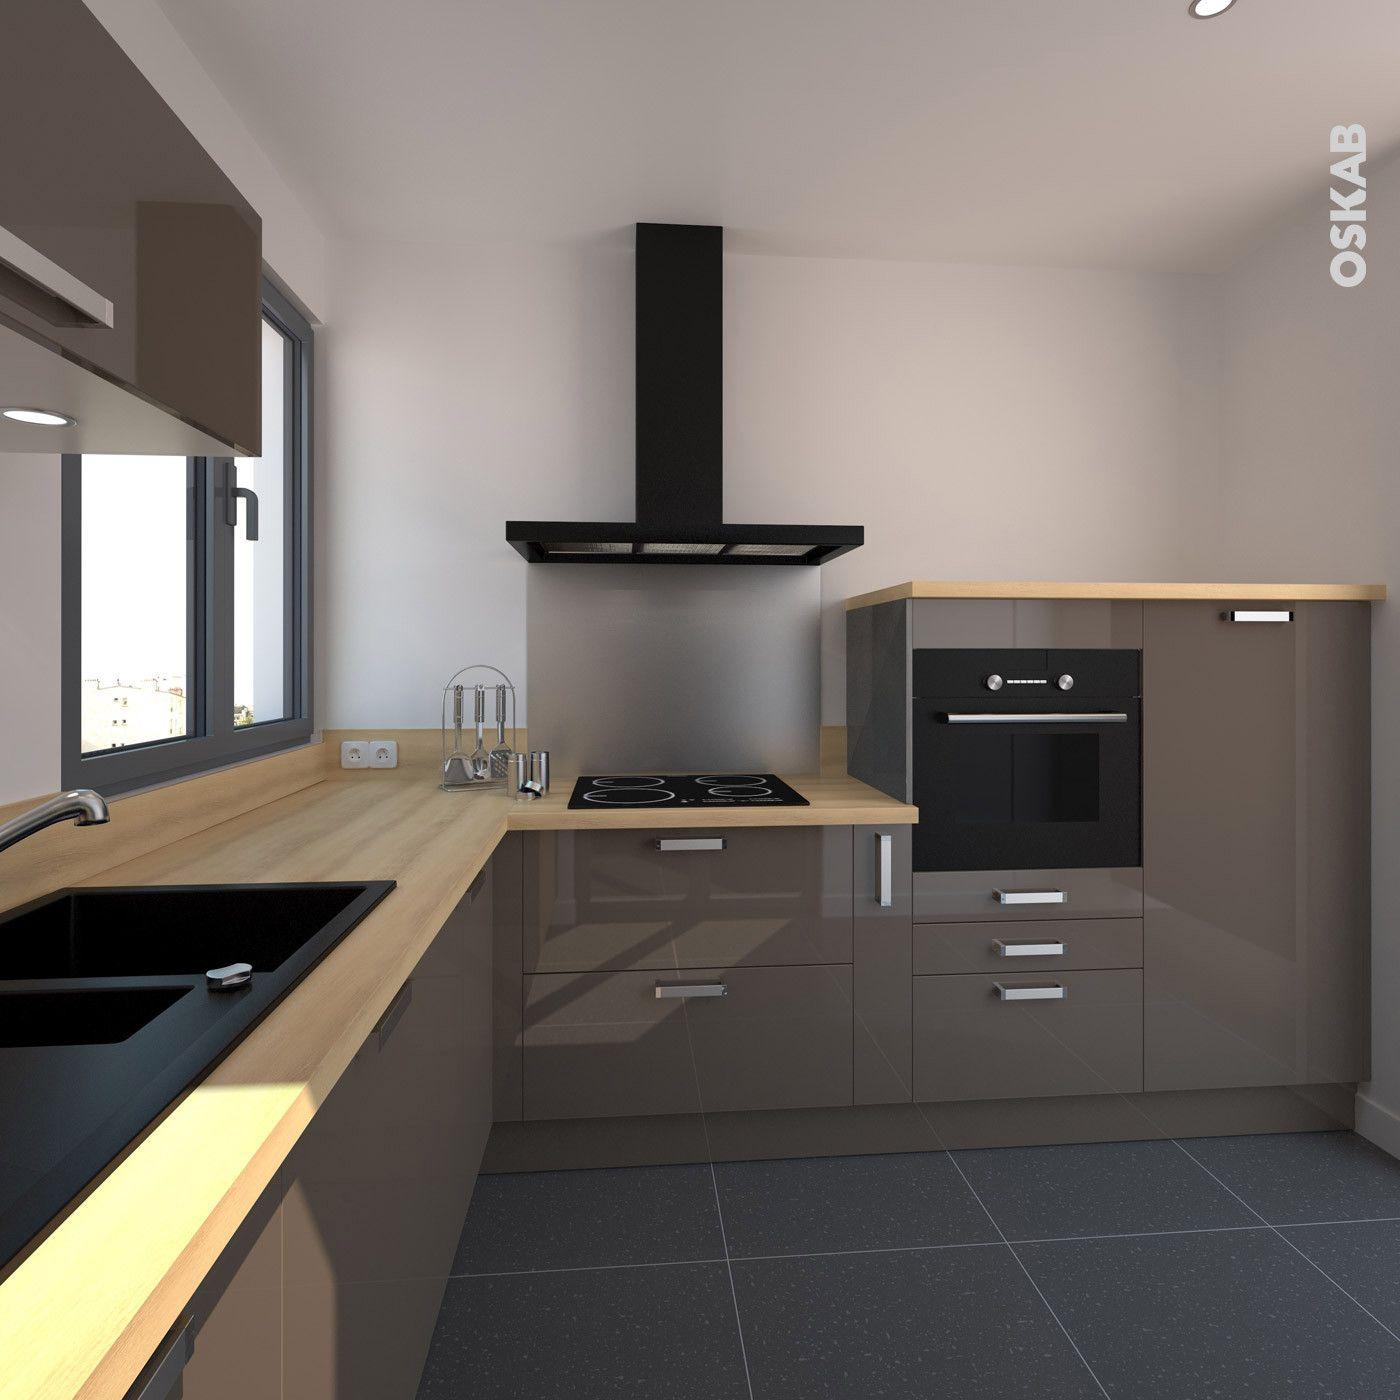 New Cuisine Couleur Taupe Clair Kitchen Inspirations Cuisine Design Wooden Kitchen